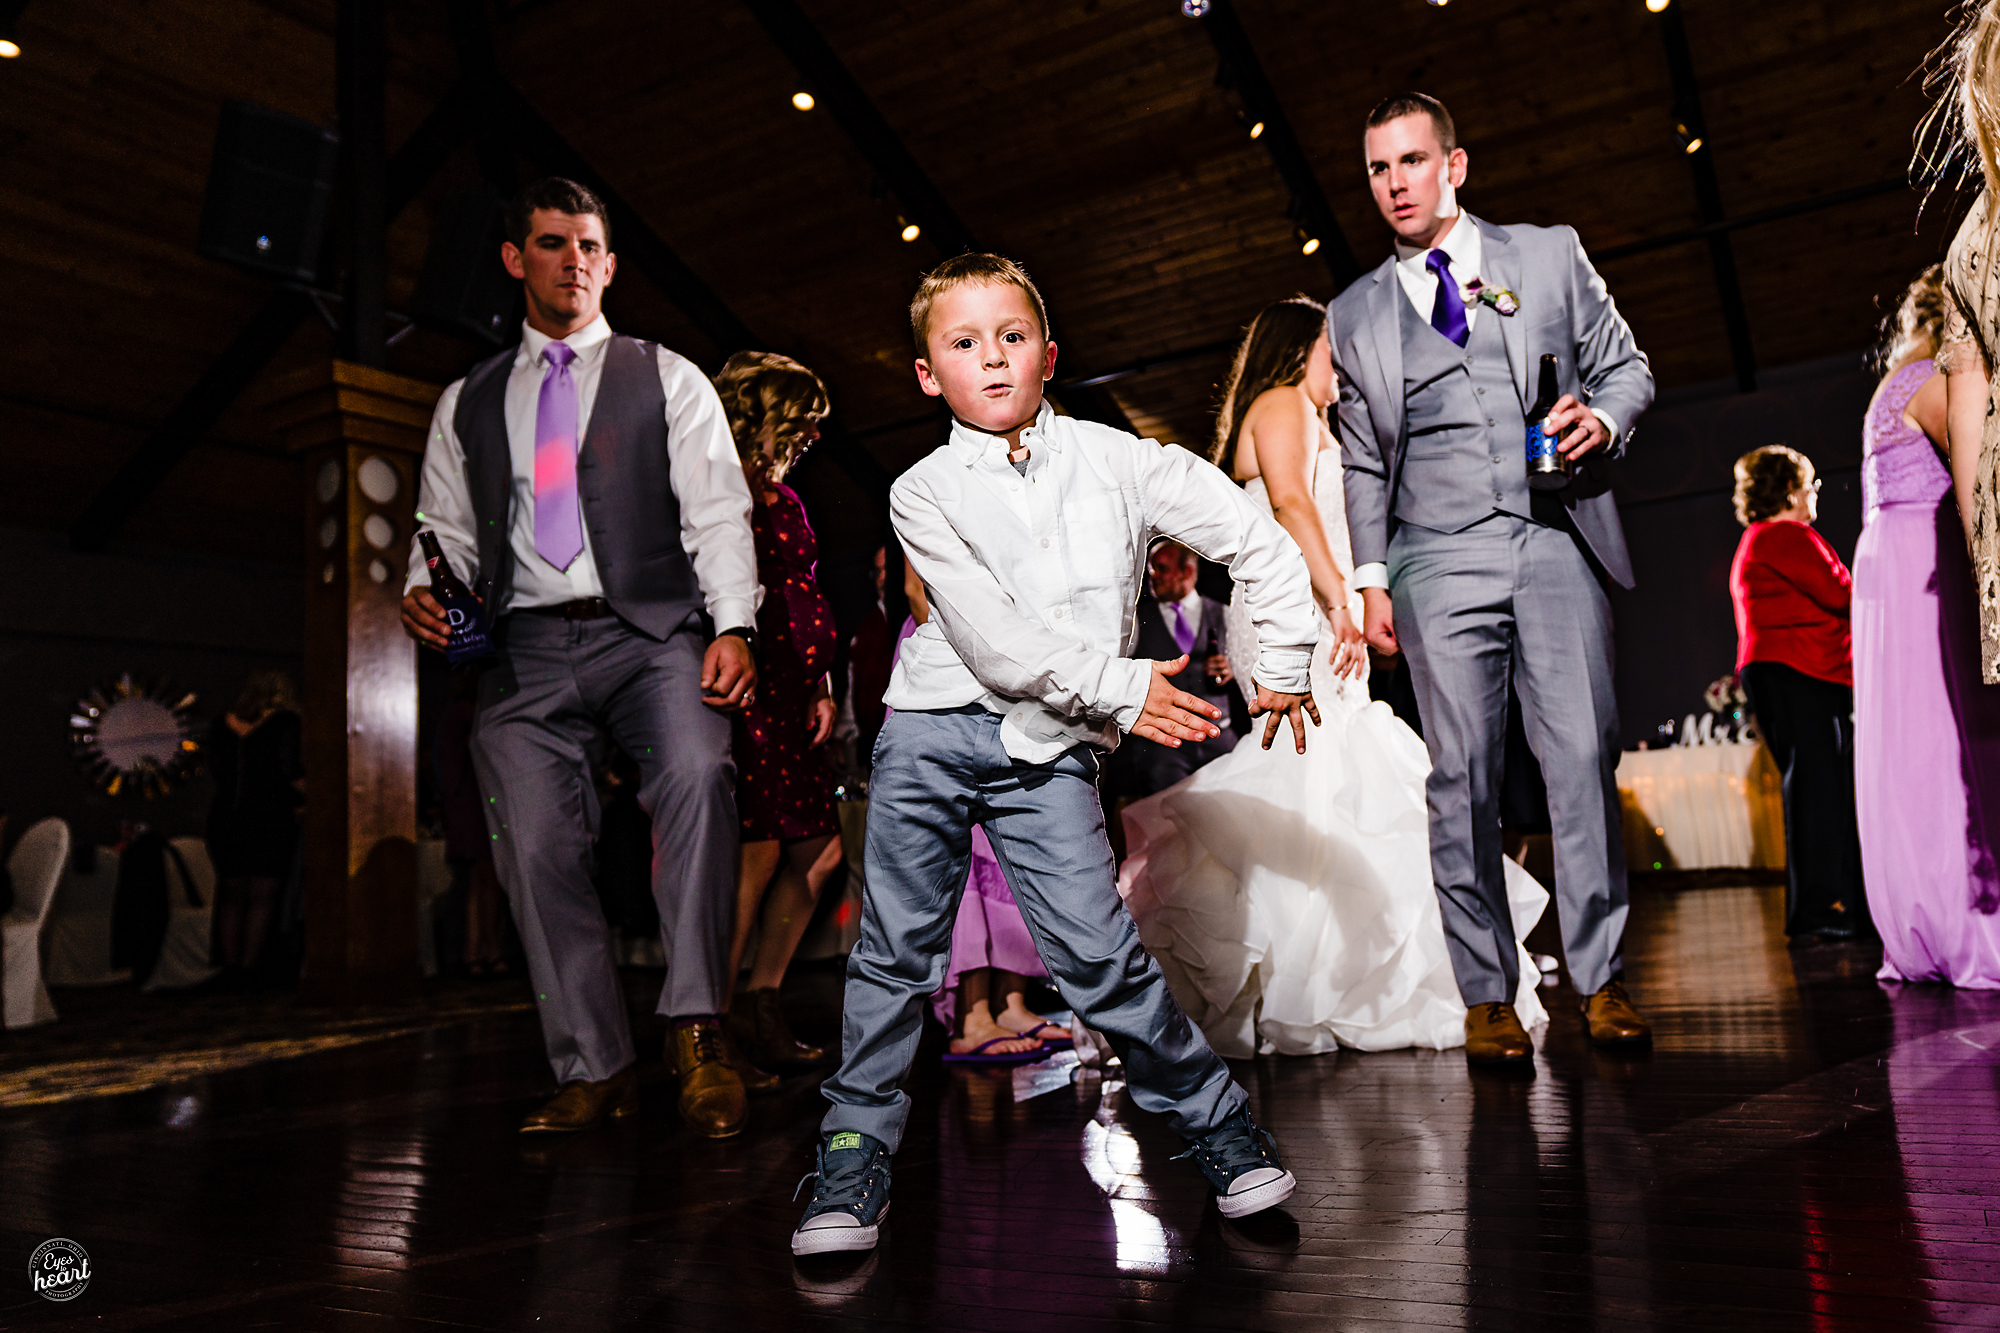 The-Pinnacle-Ballroom-Covington-KY-Wedding-Photography-24.jpg